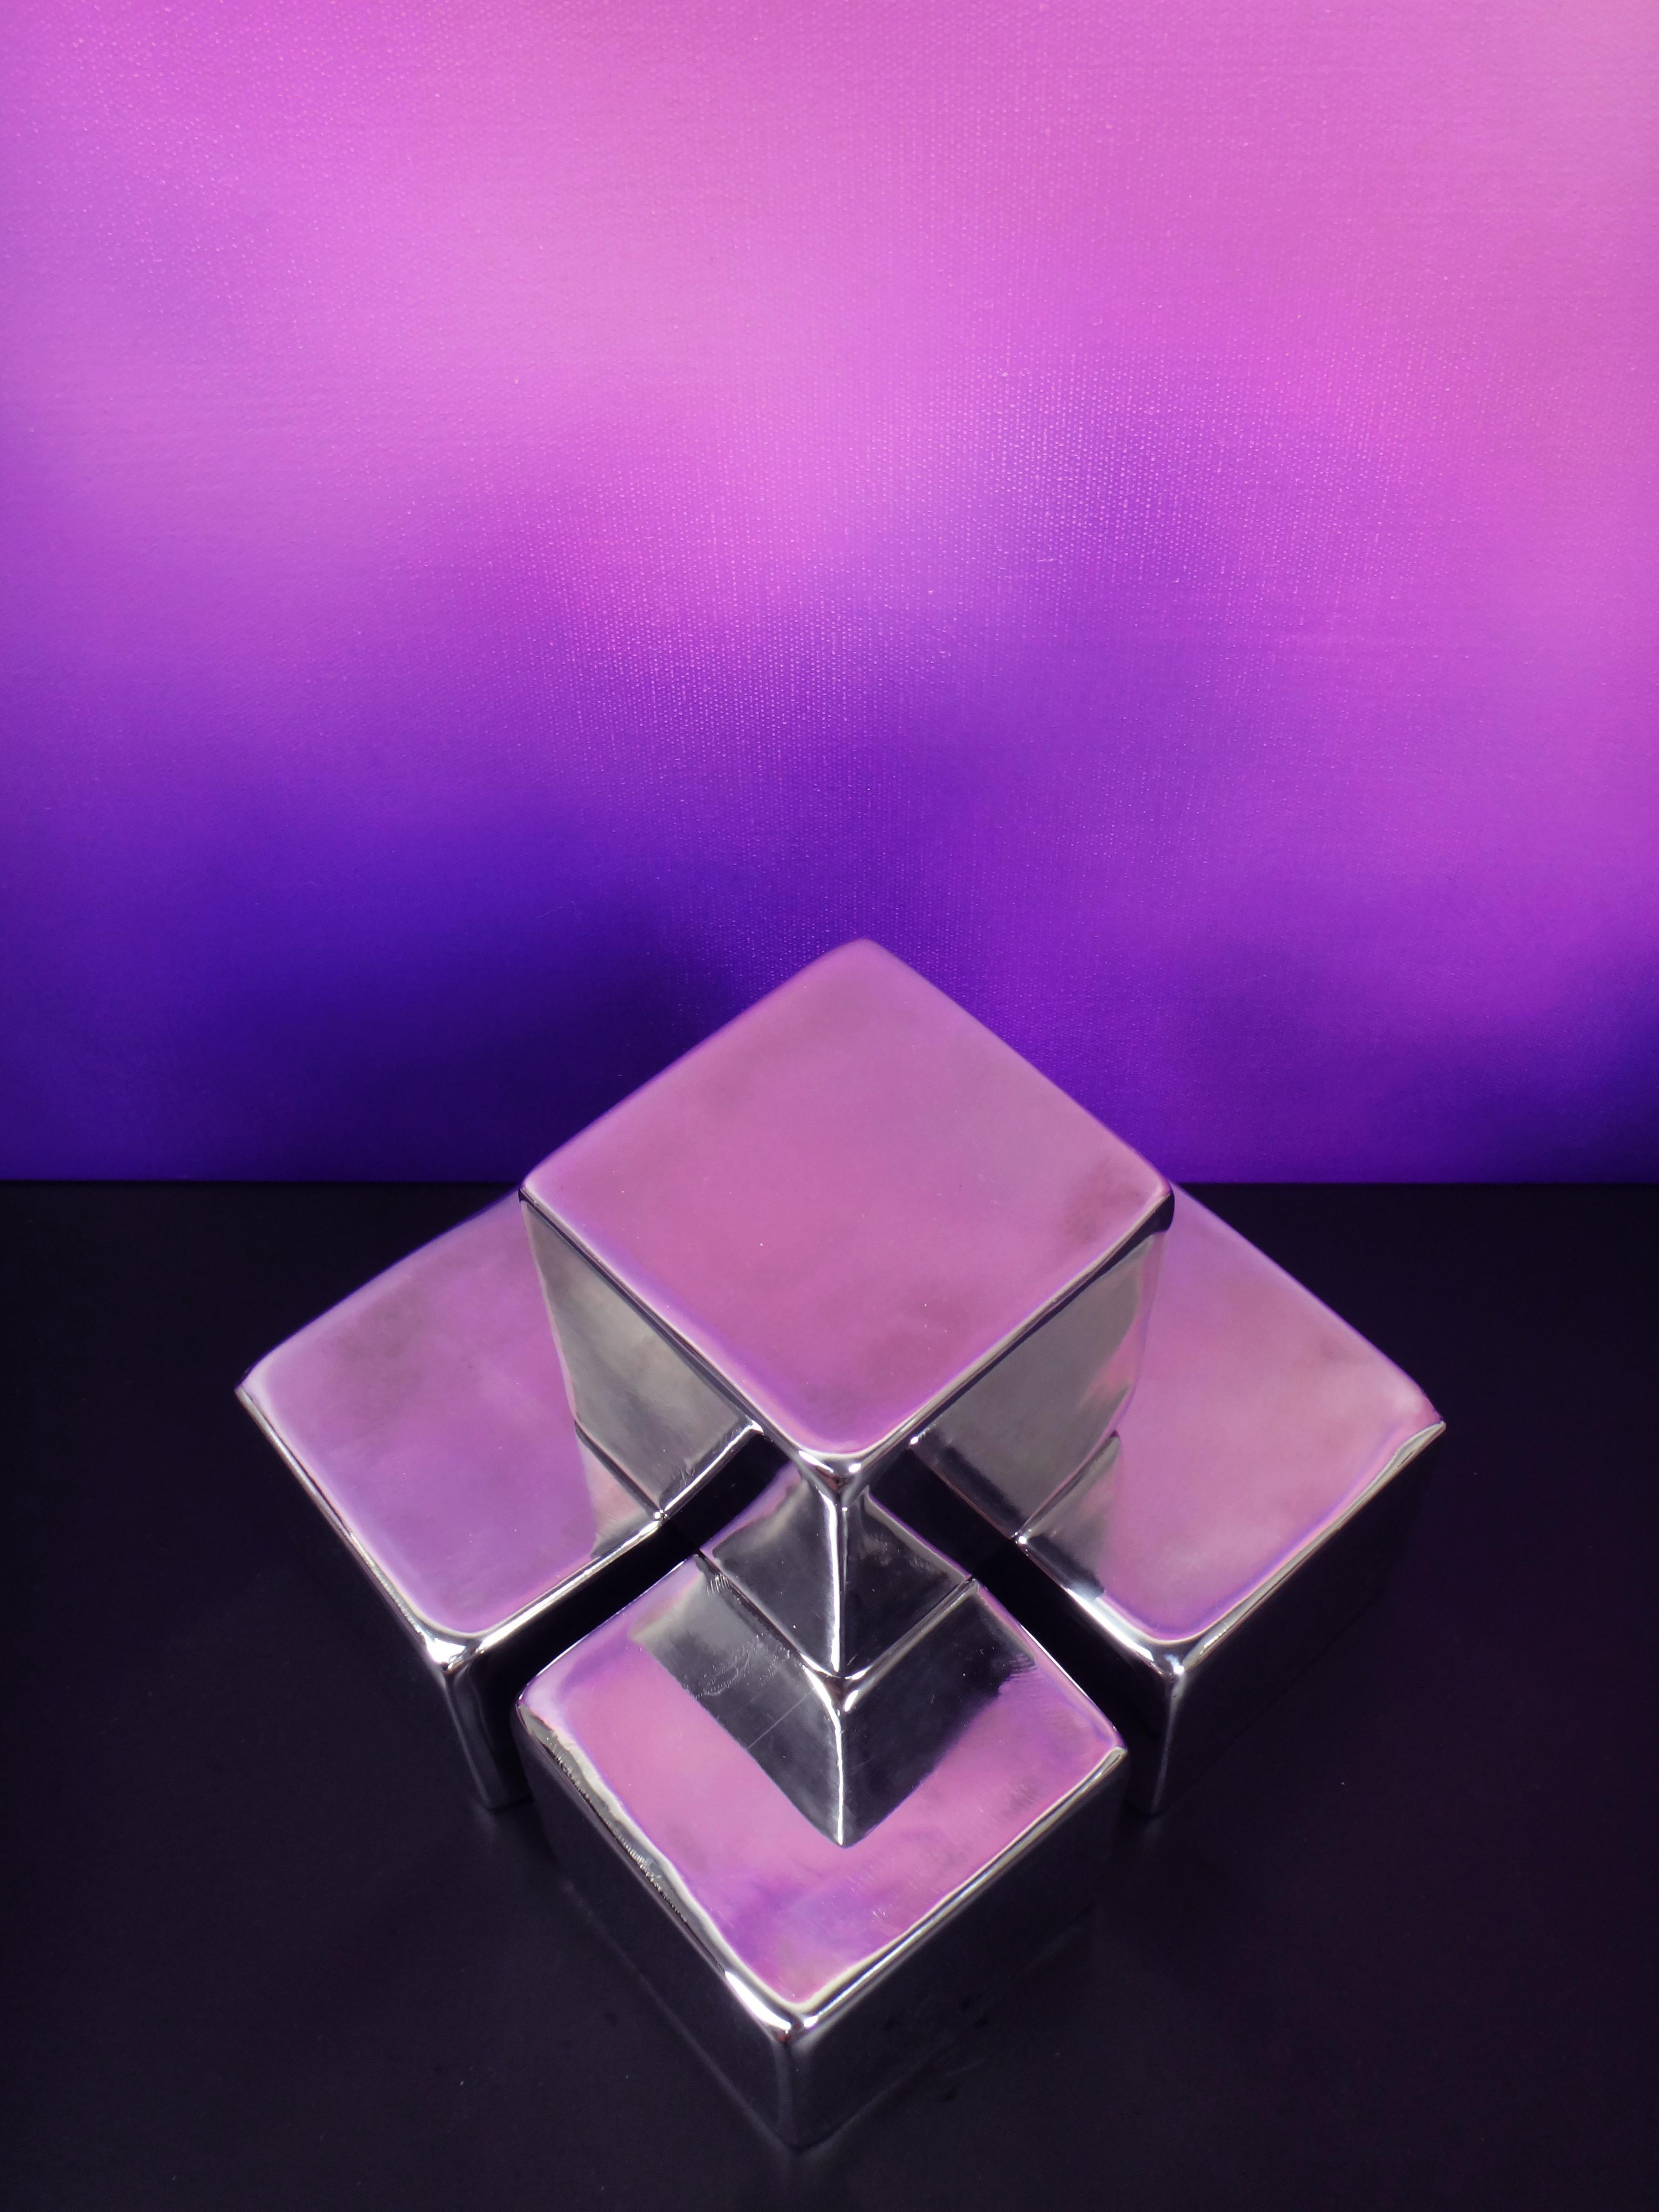 Formless - Steel Sculpture, Cube, Reflective